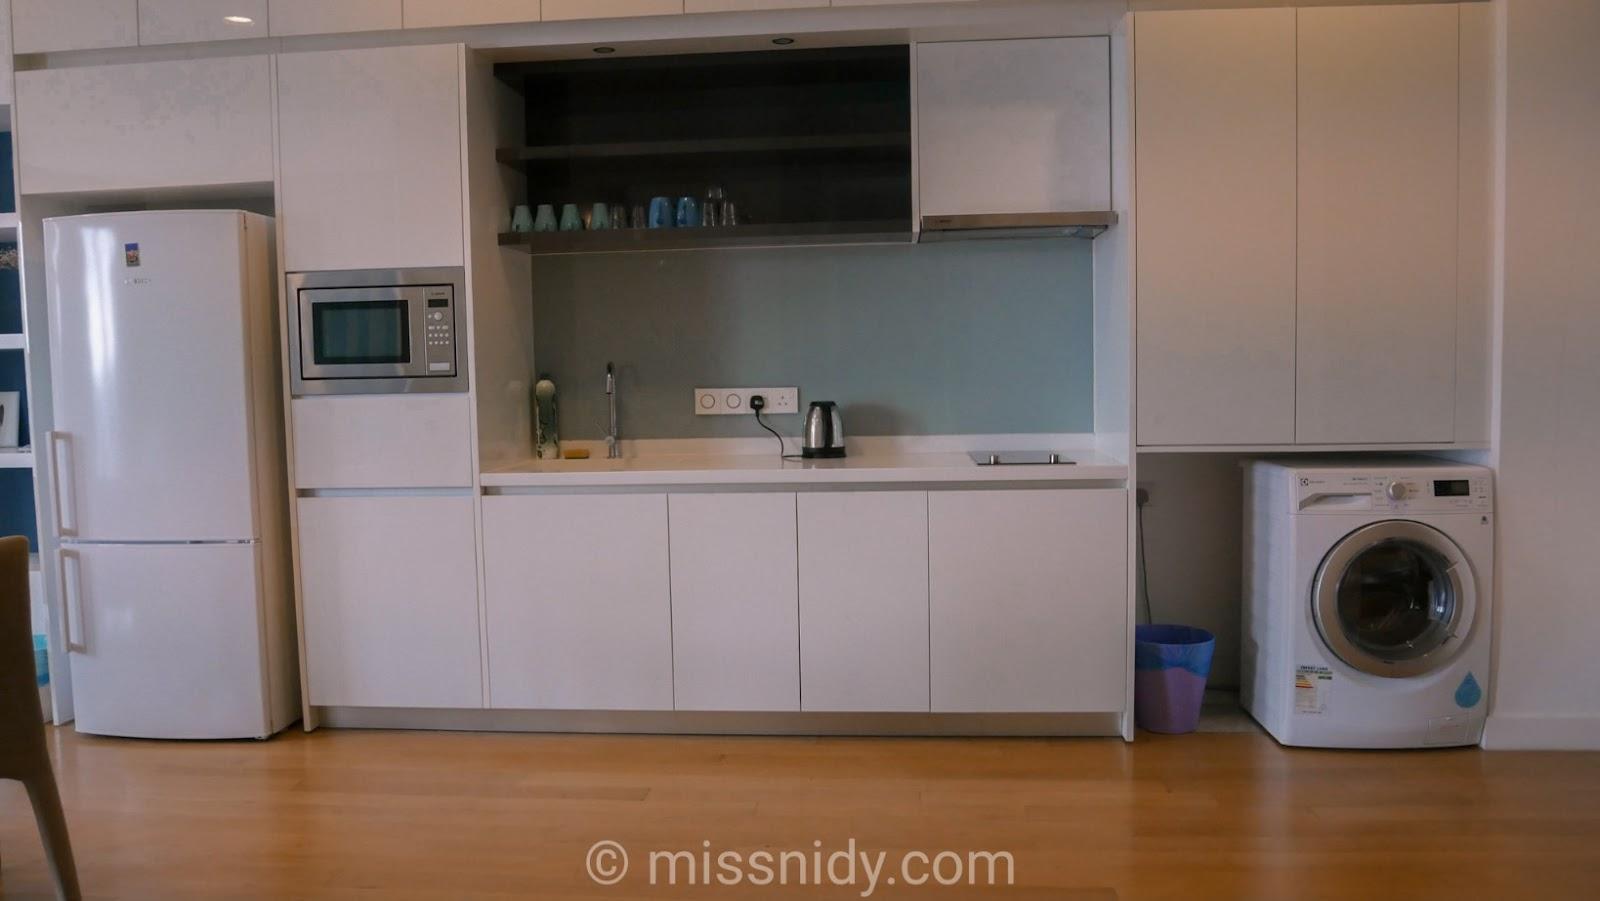 apartemen dengan dapur di kuala lumpur malaysia